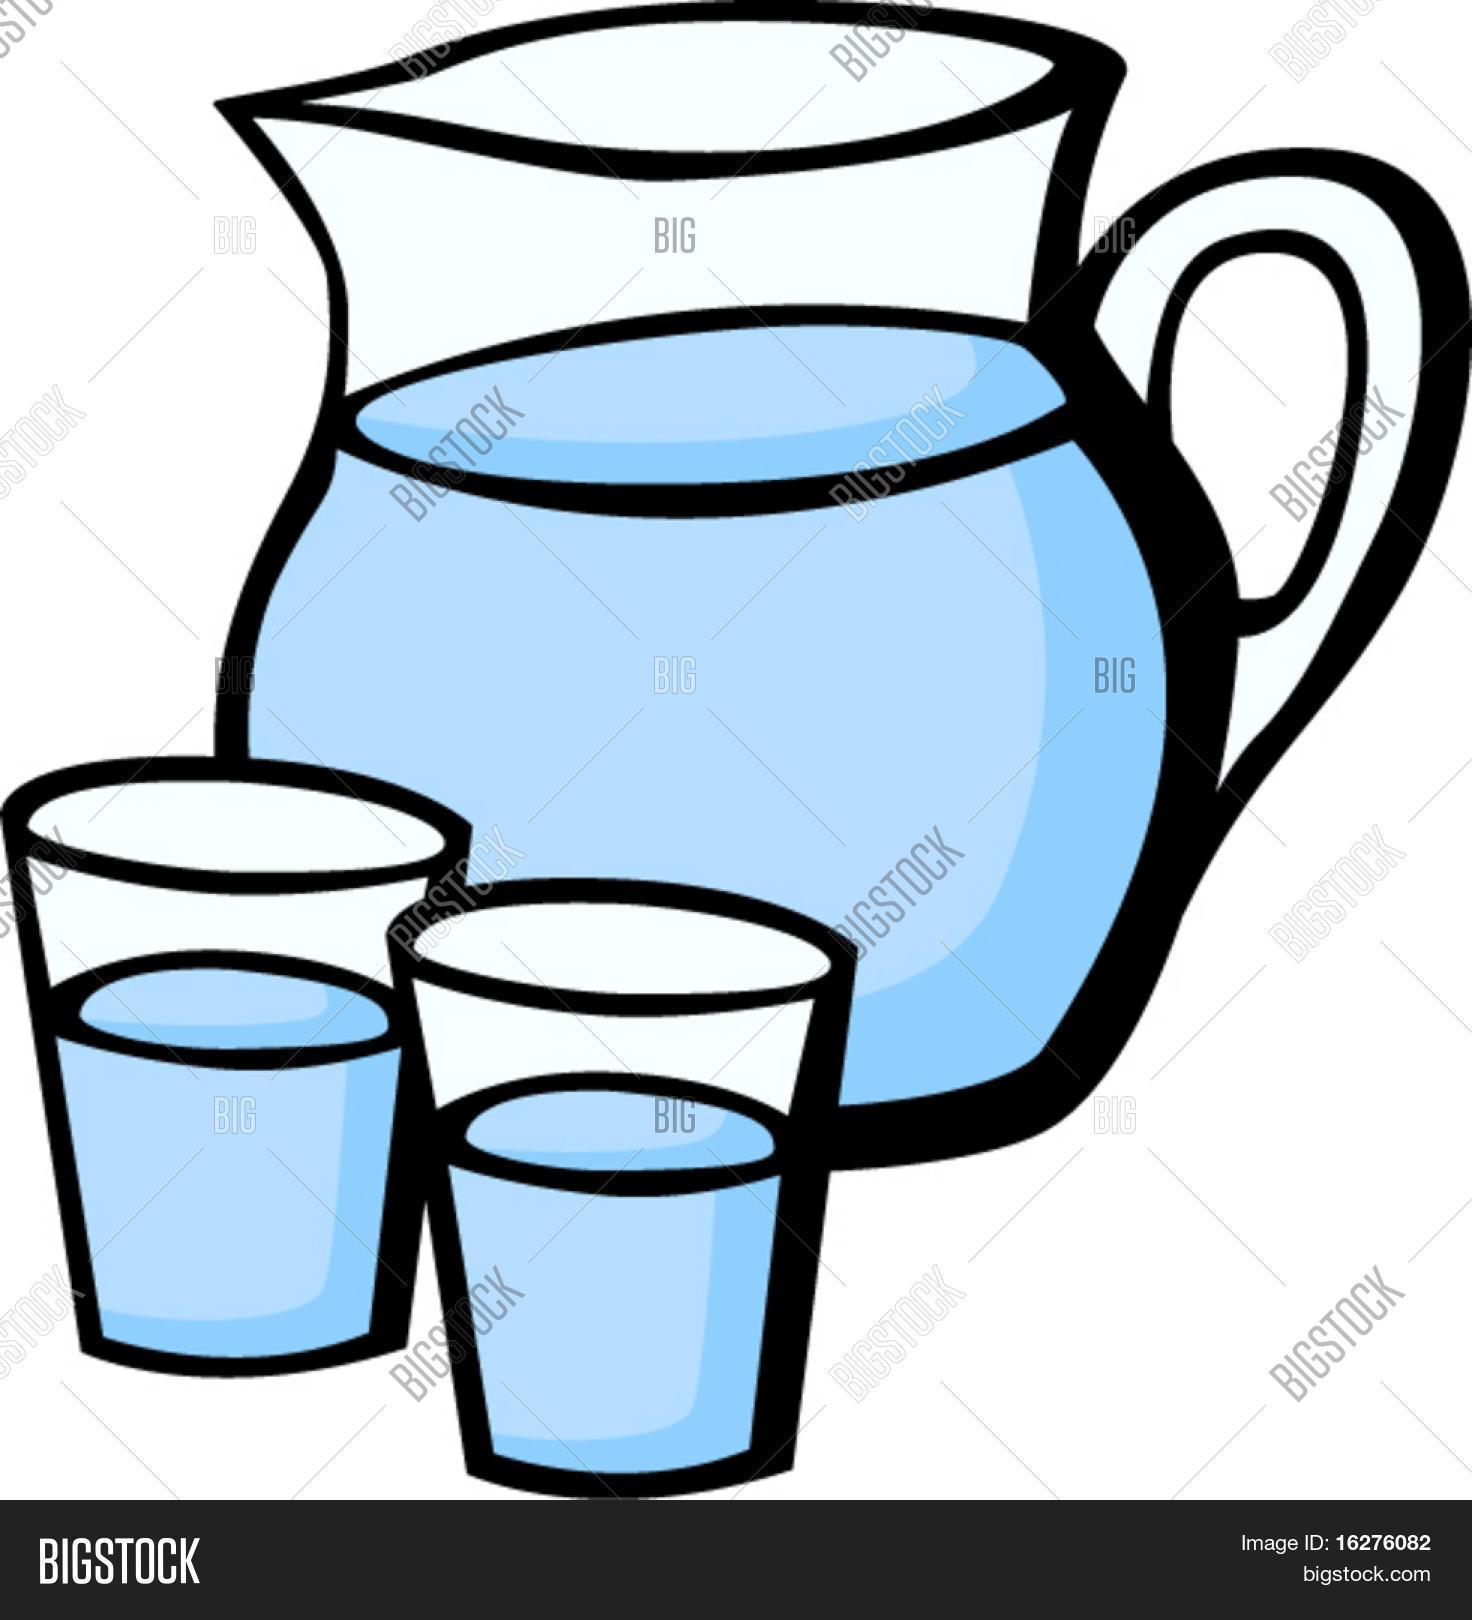 Water pitcher clipart 3 » Clipart Portal.